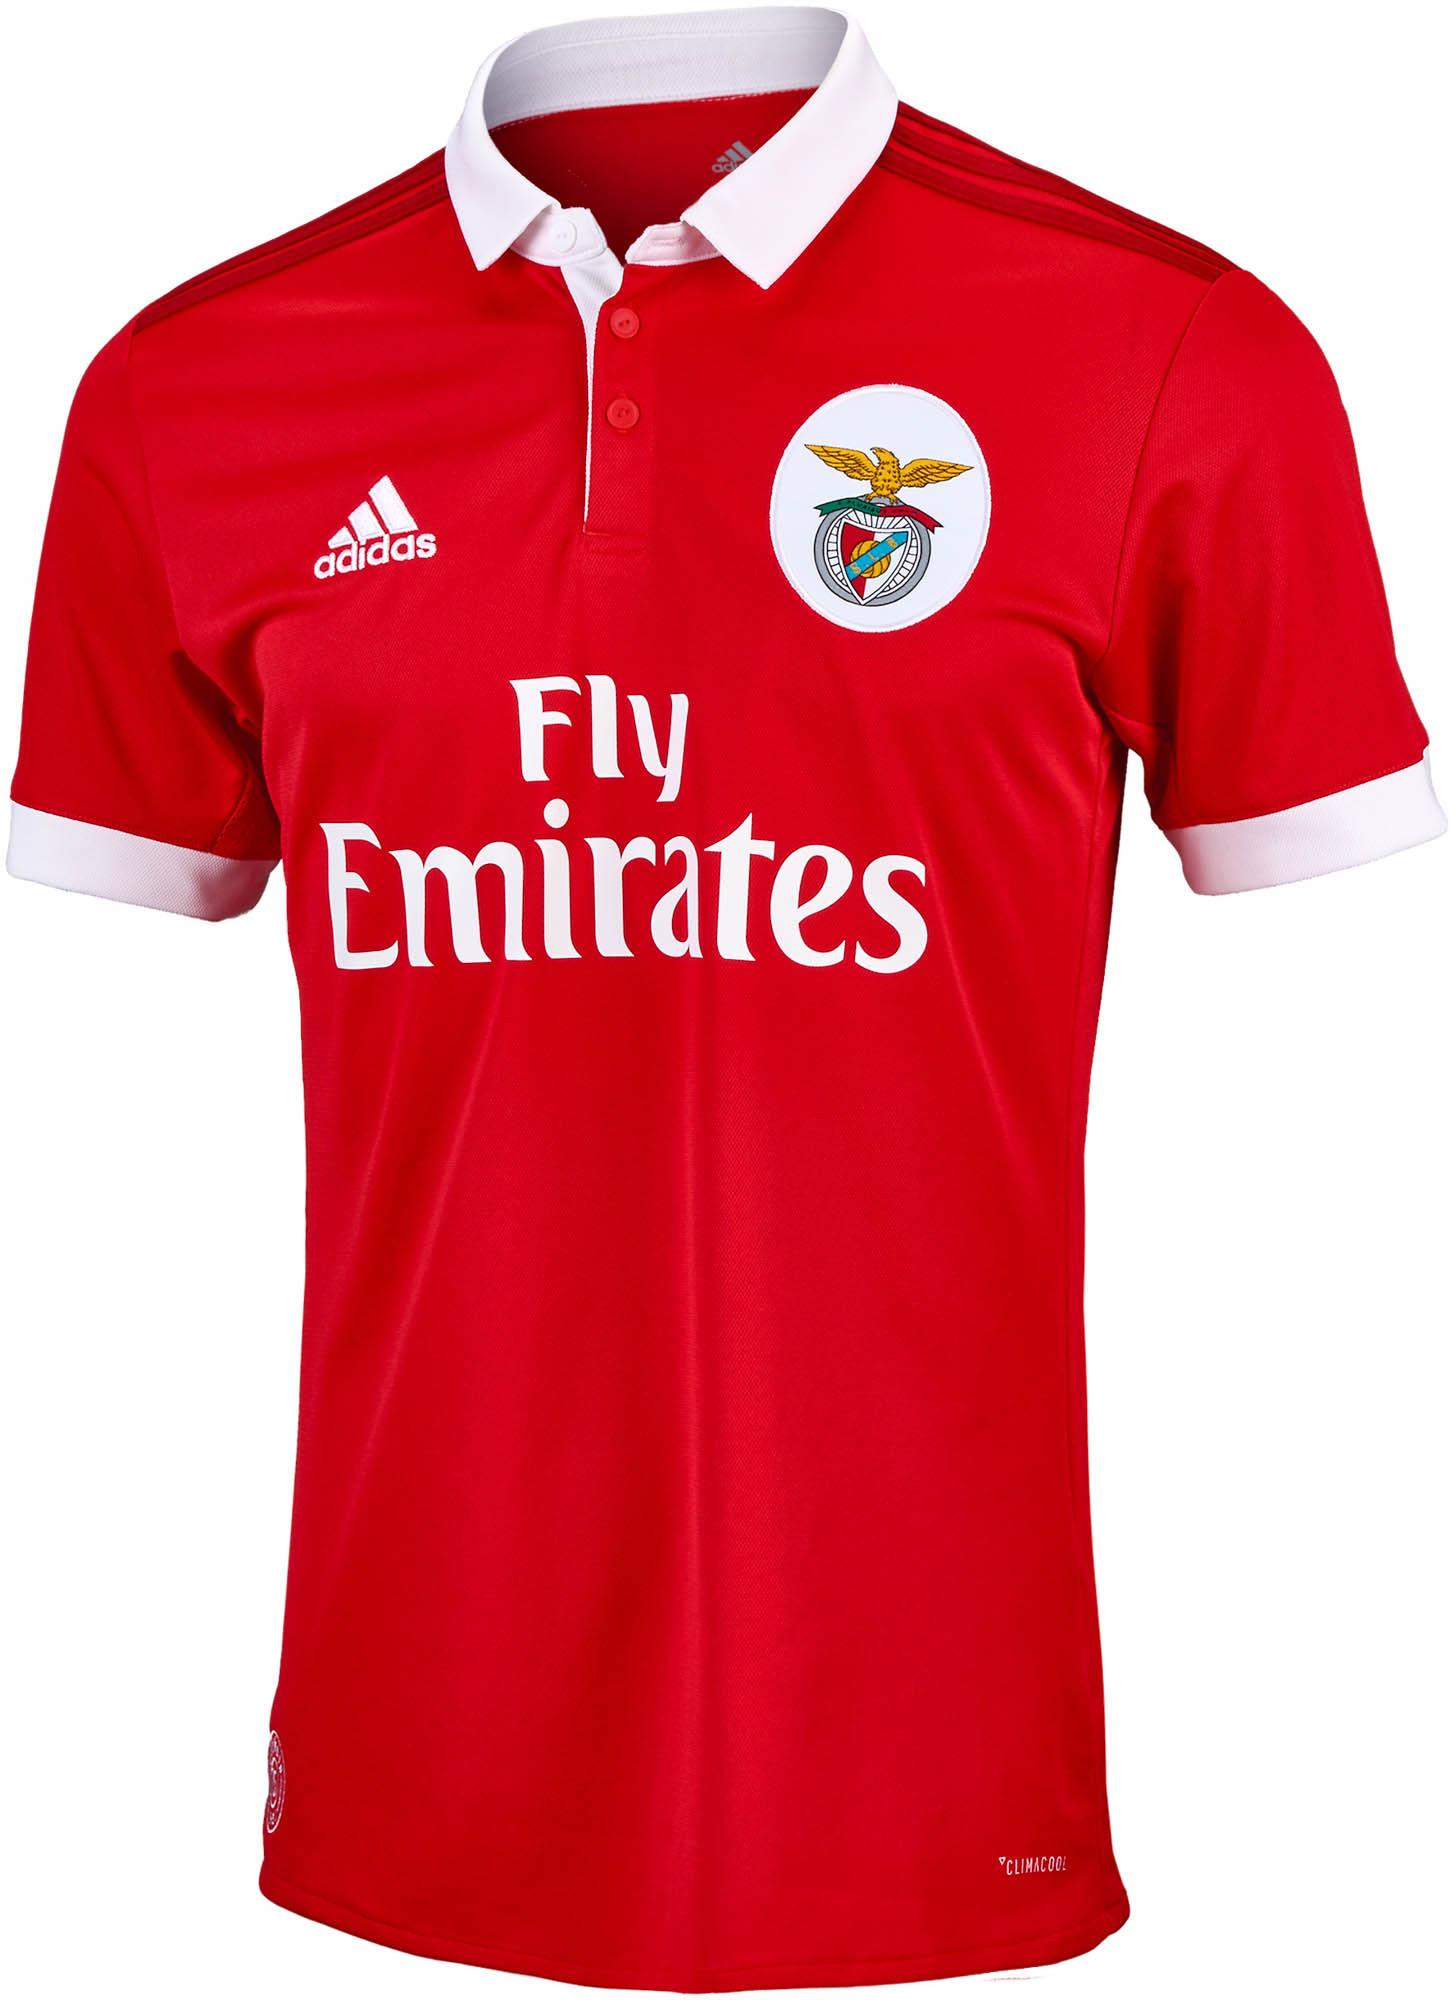 adidas Benfica Home Jersey 2017 18